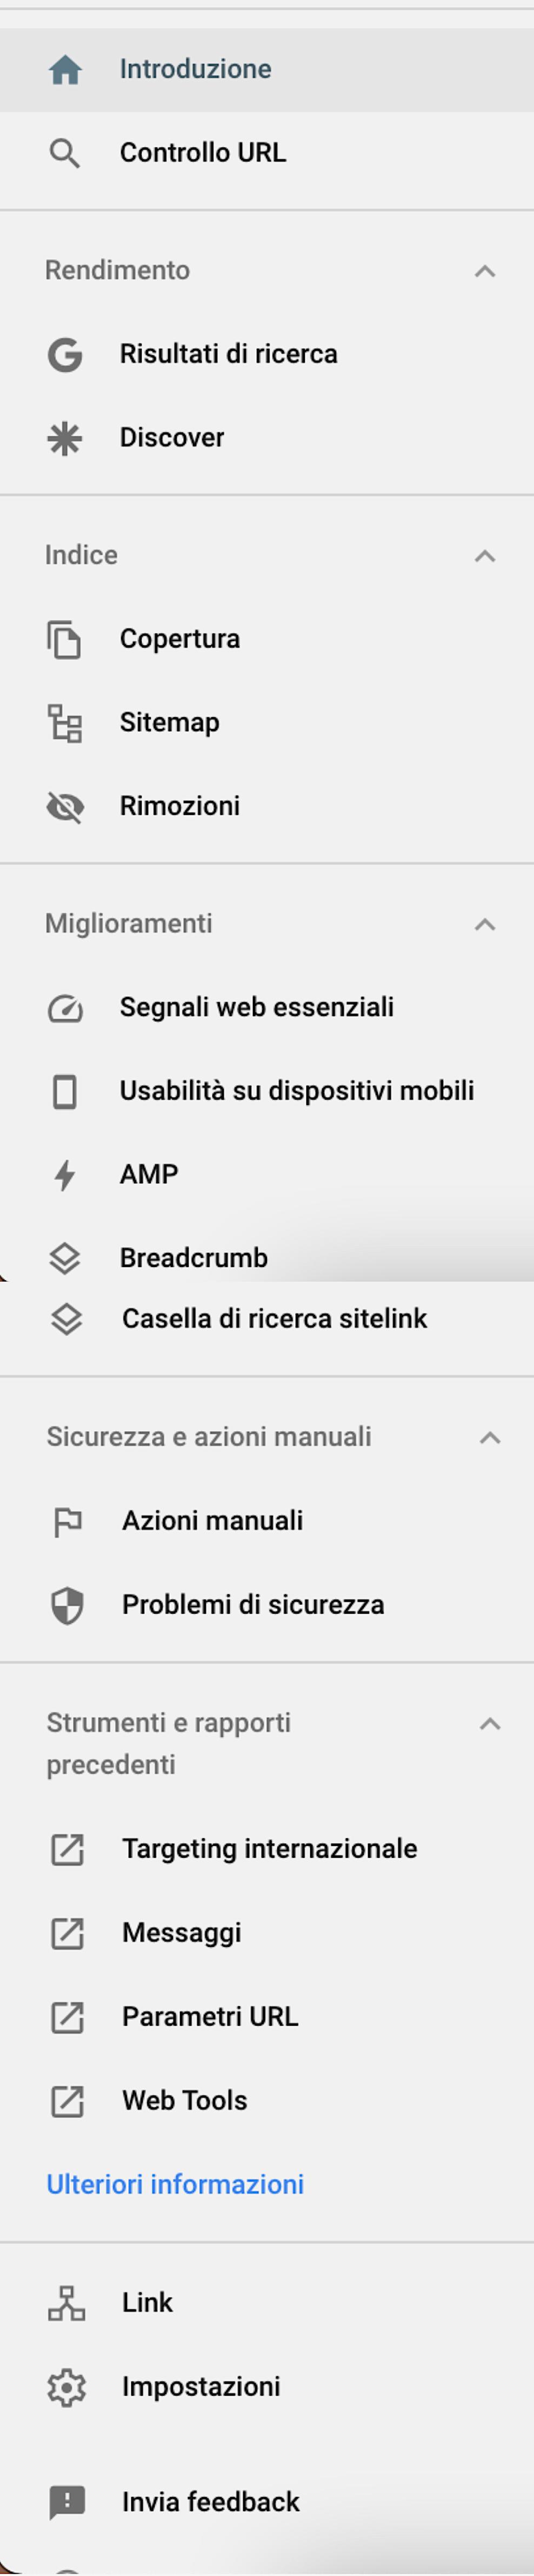 Google Search Console_menu